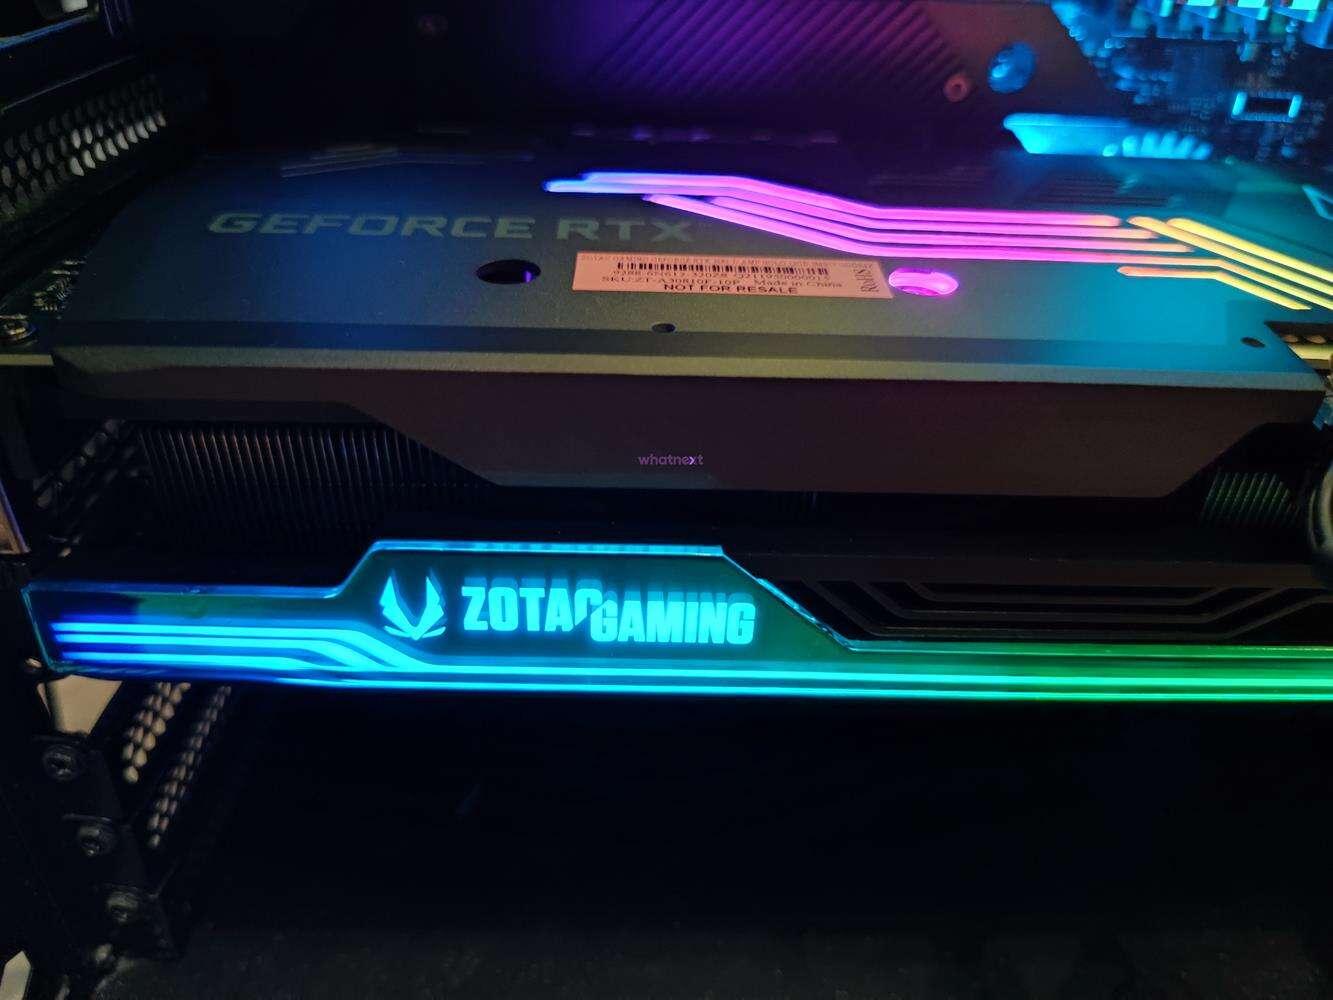 test Zotac GeForce RTX 3080 Ti AMP Holo, recenzja Zotac GeForce RTX 3080 Ti AMP Holo, opinia Zotac GeForce RTX 3080 Ti AMP Holo